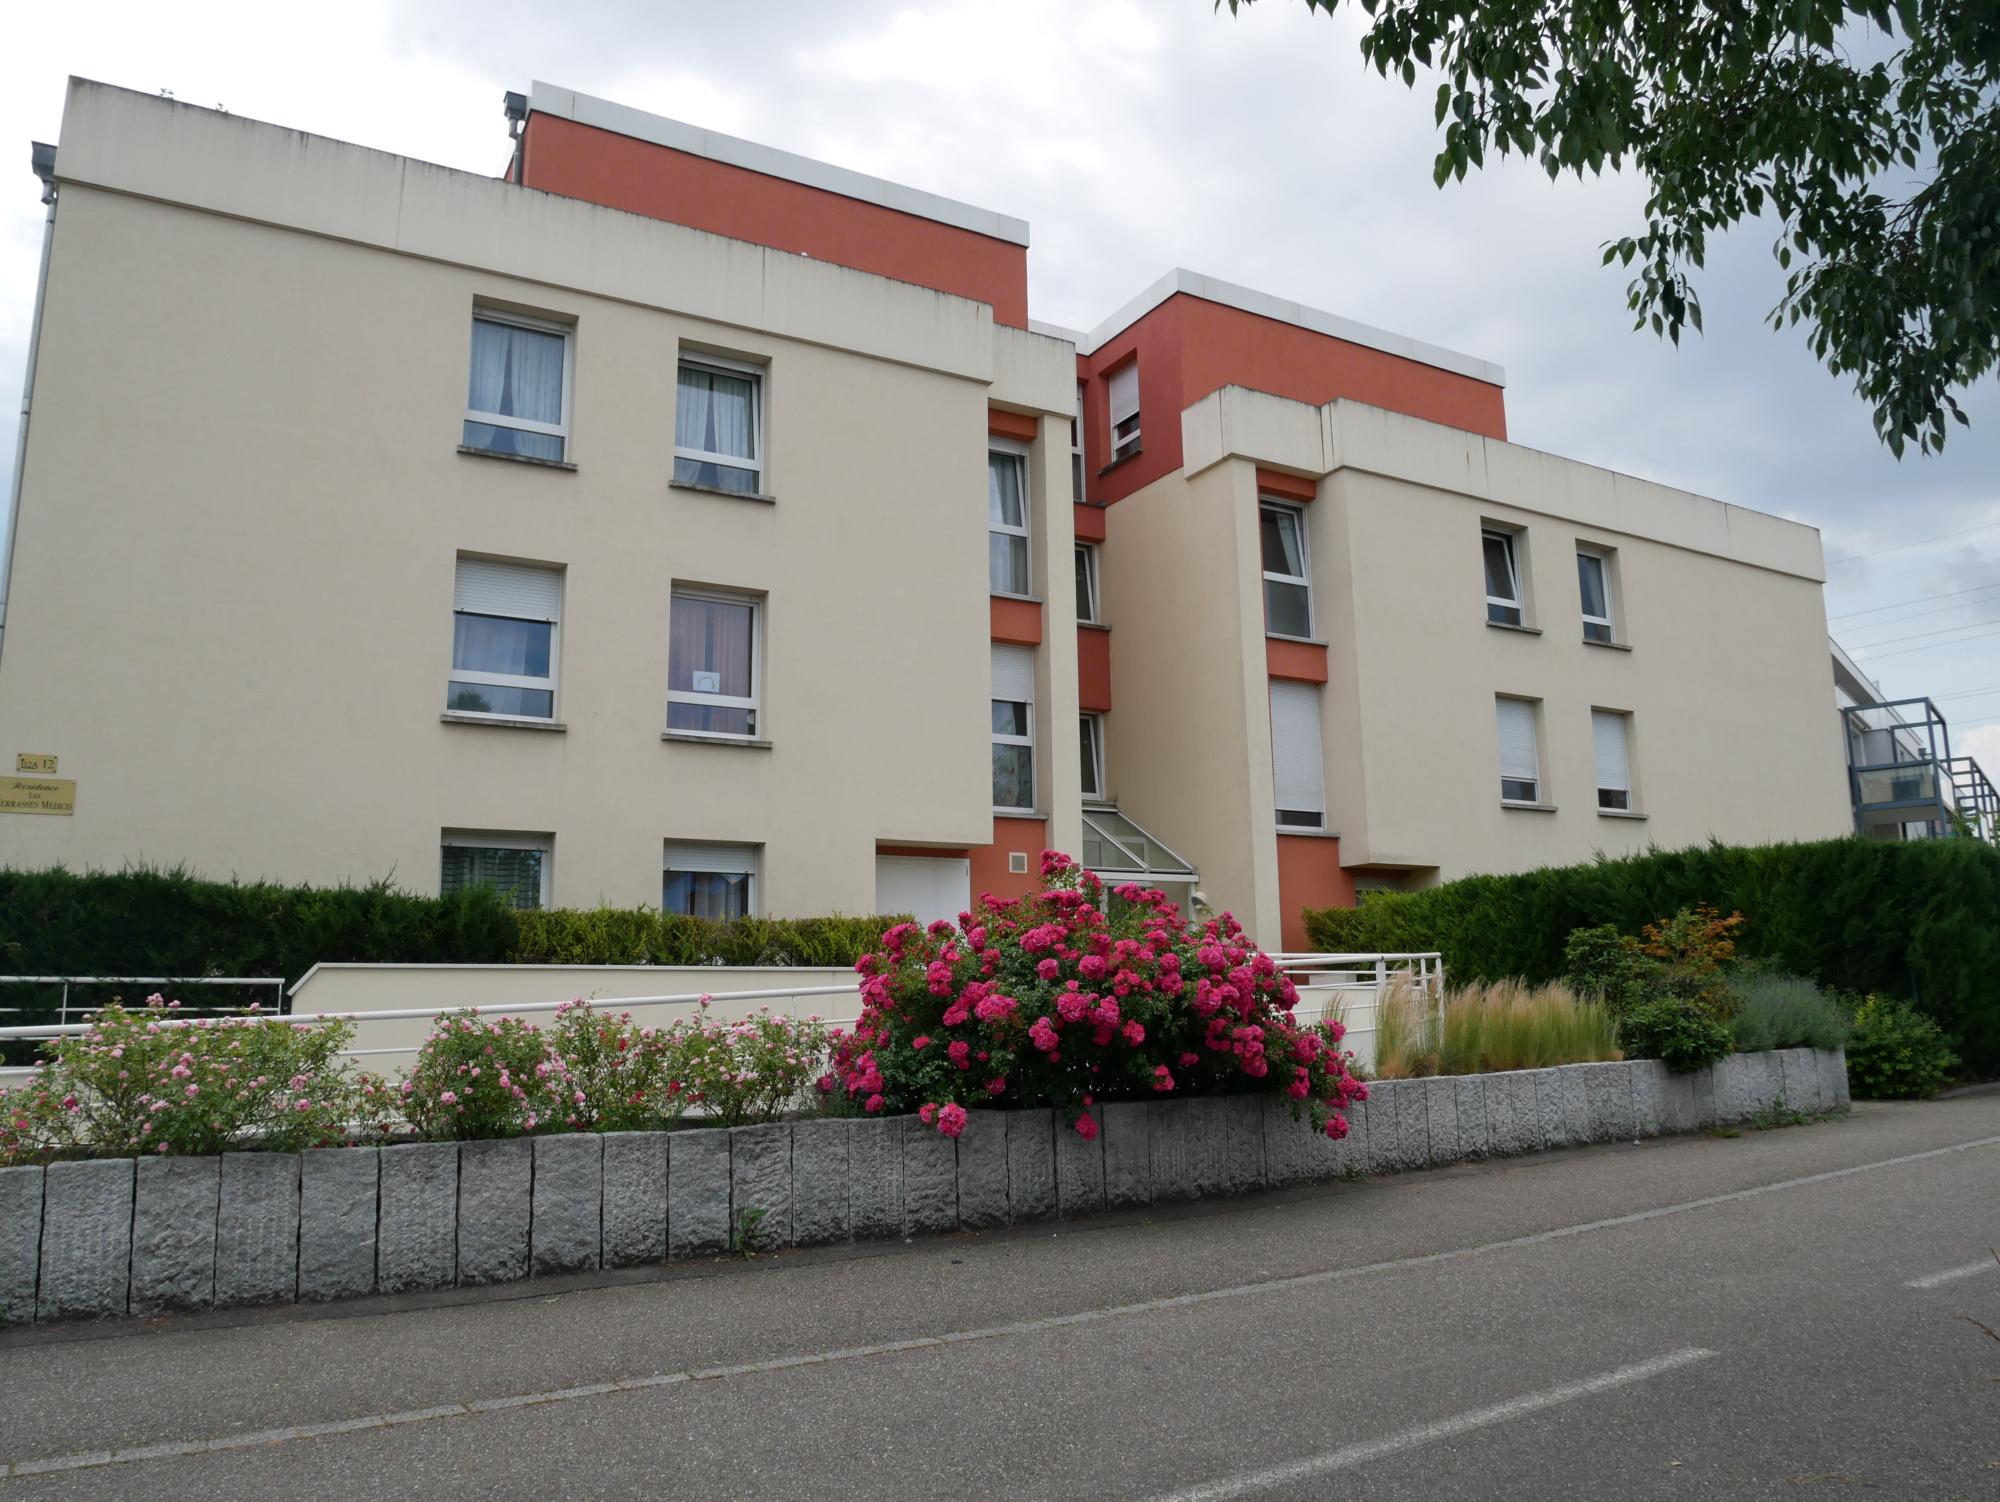 [Fresh] Lumineux 3 pièces avec balcon et parking - Souffelweyersheim - nos ventes - Beausite Immobilier 12